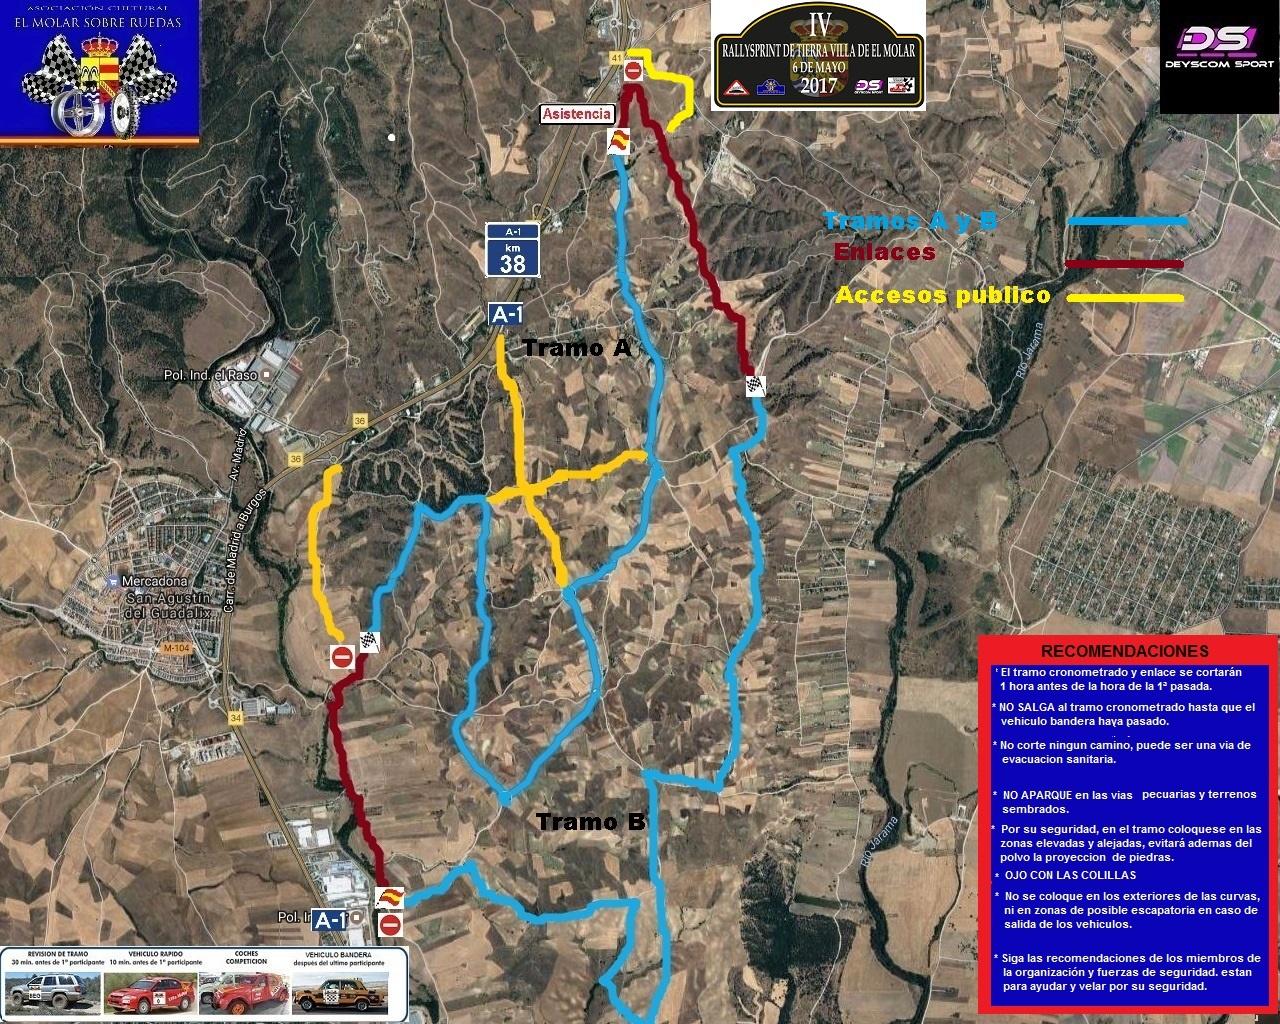 IV Rallysprint Tierra El Molar